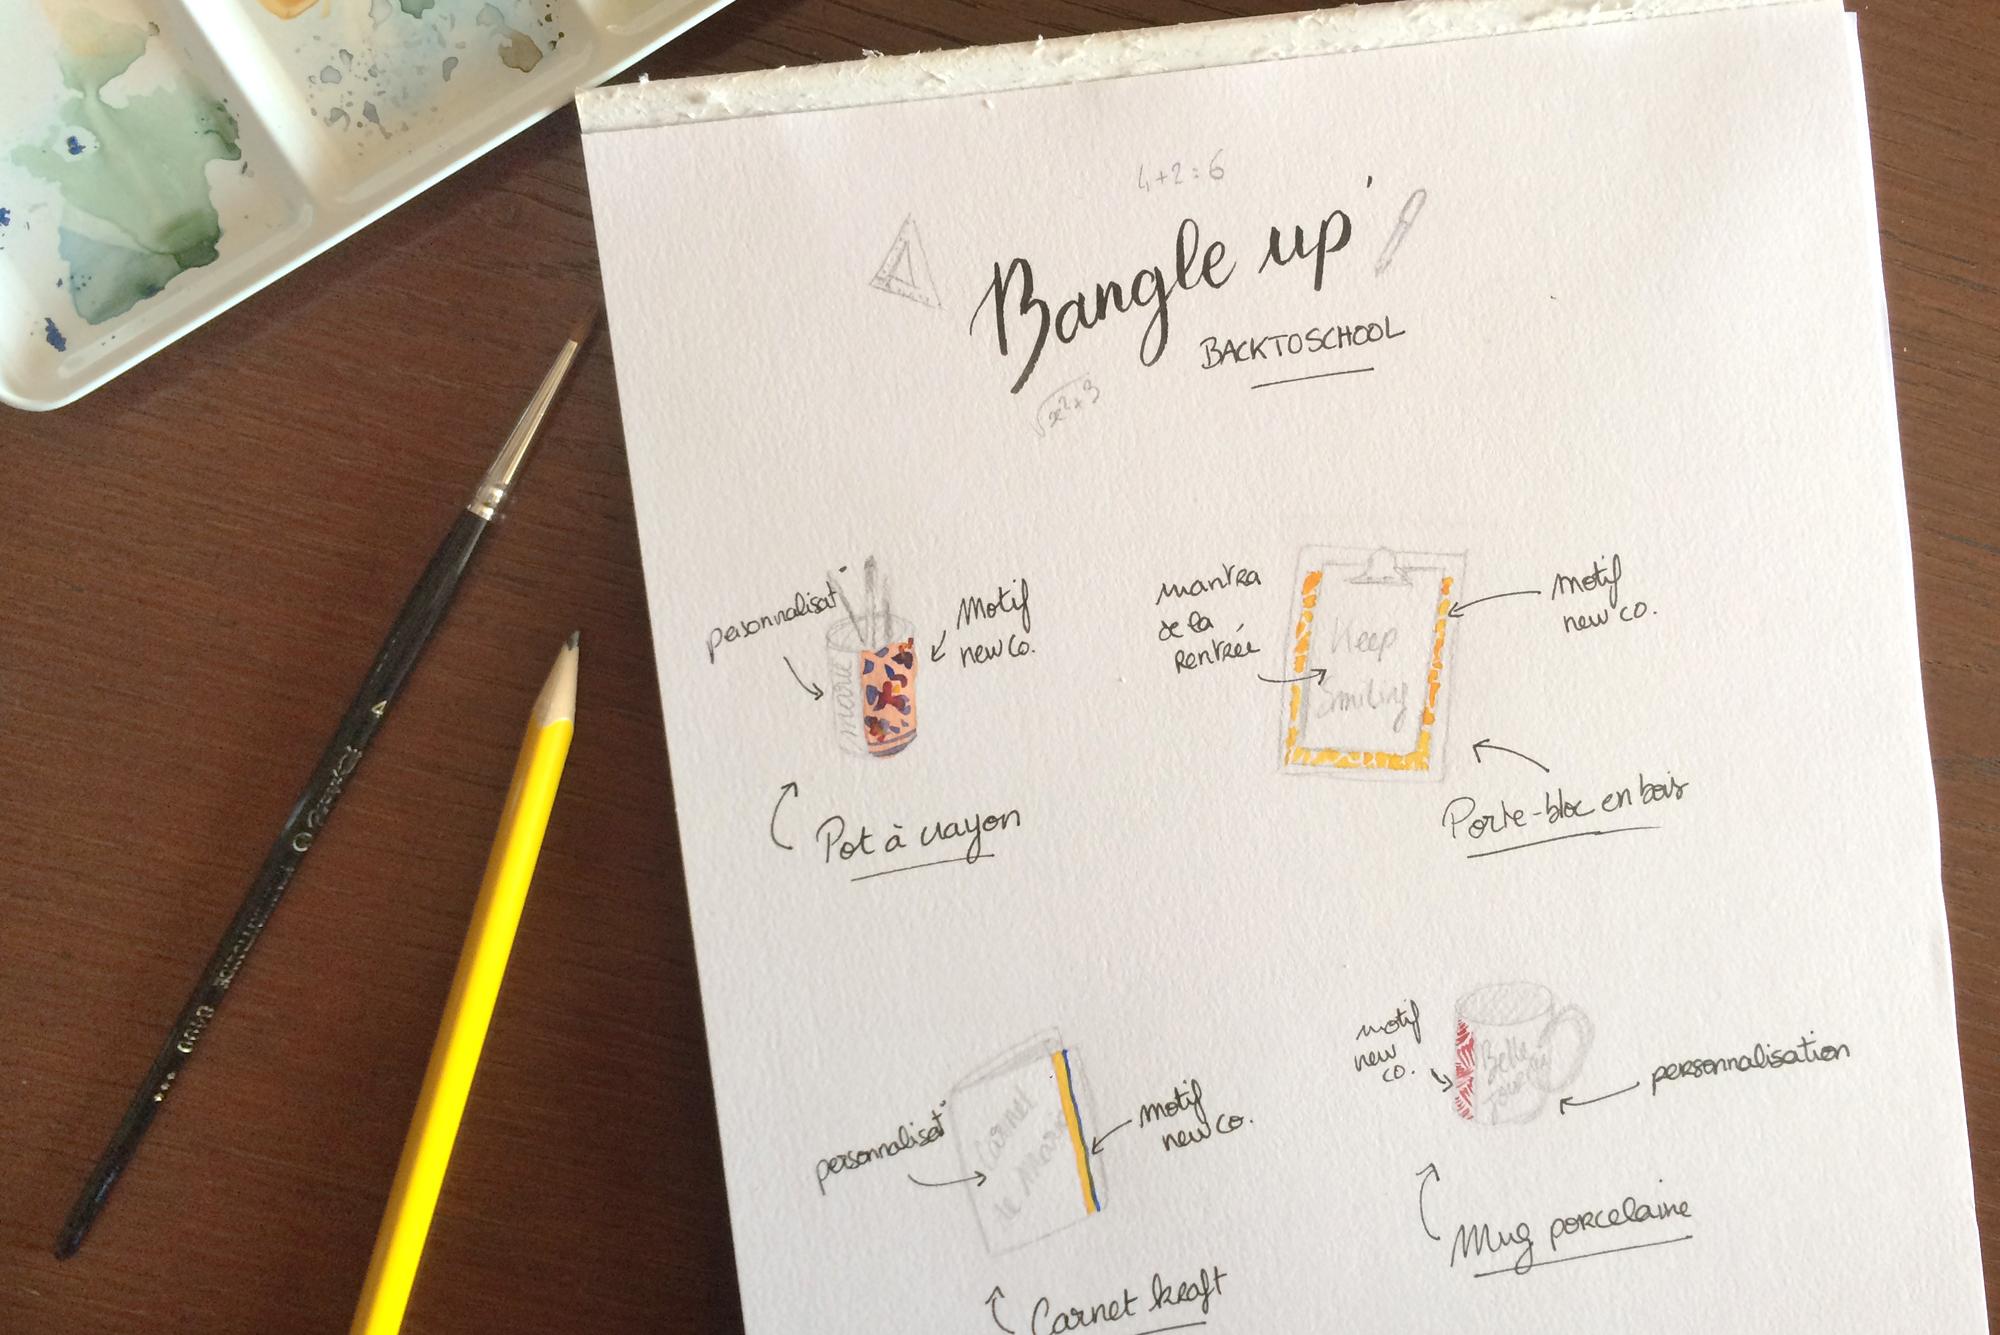 Personnalisation calligraphie Bangle Up – Calligraphique